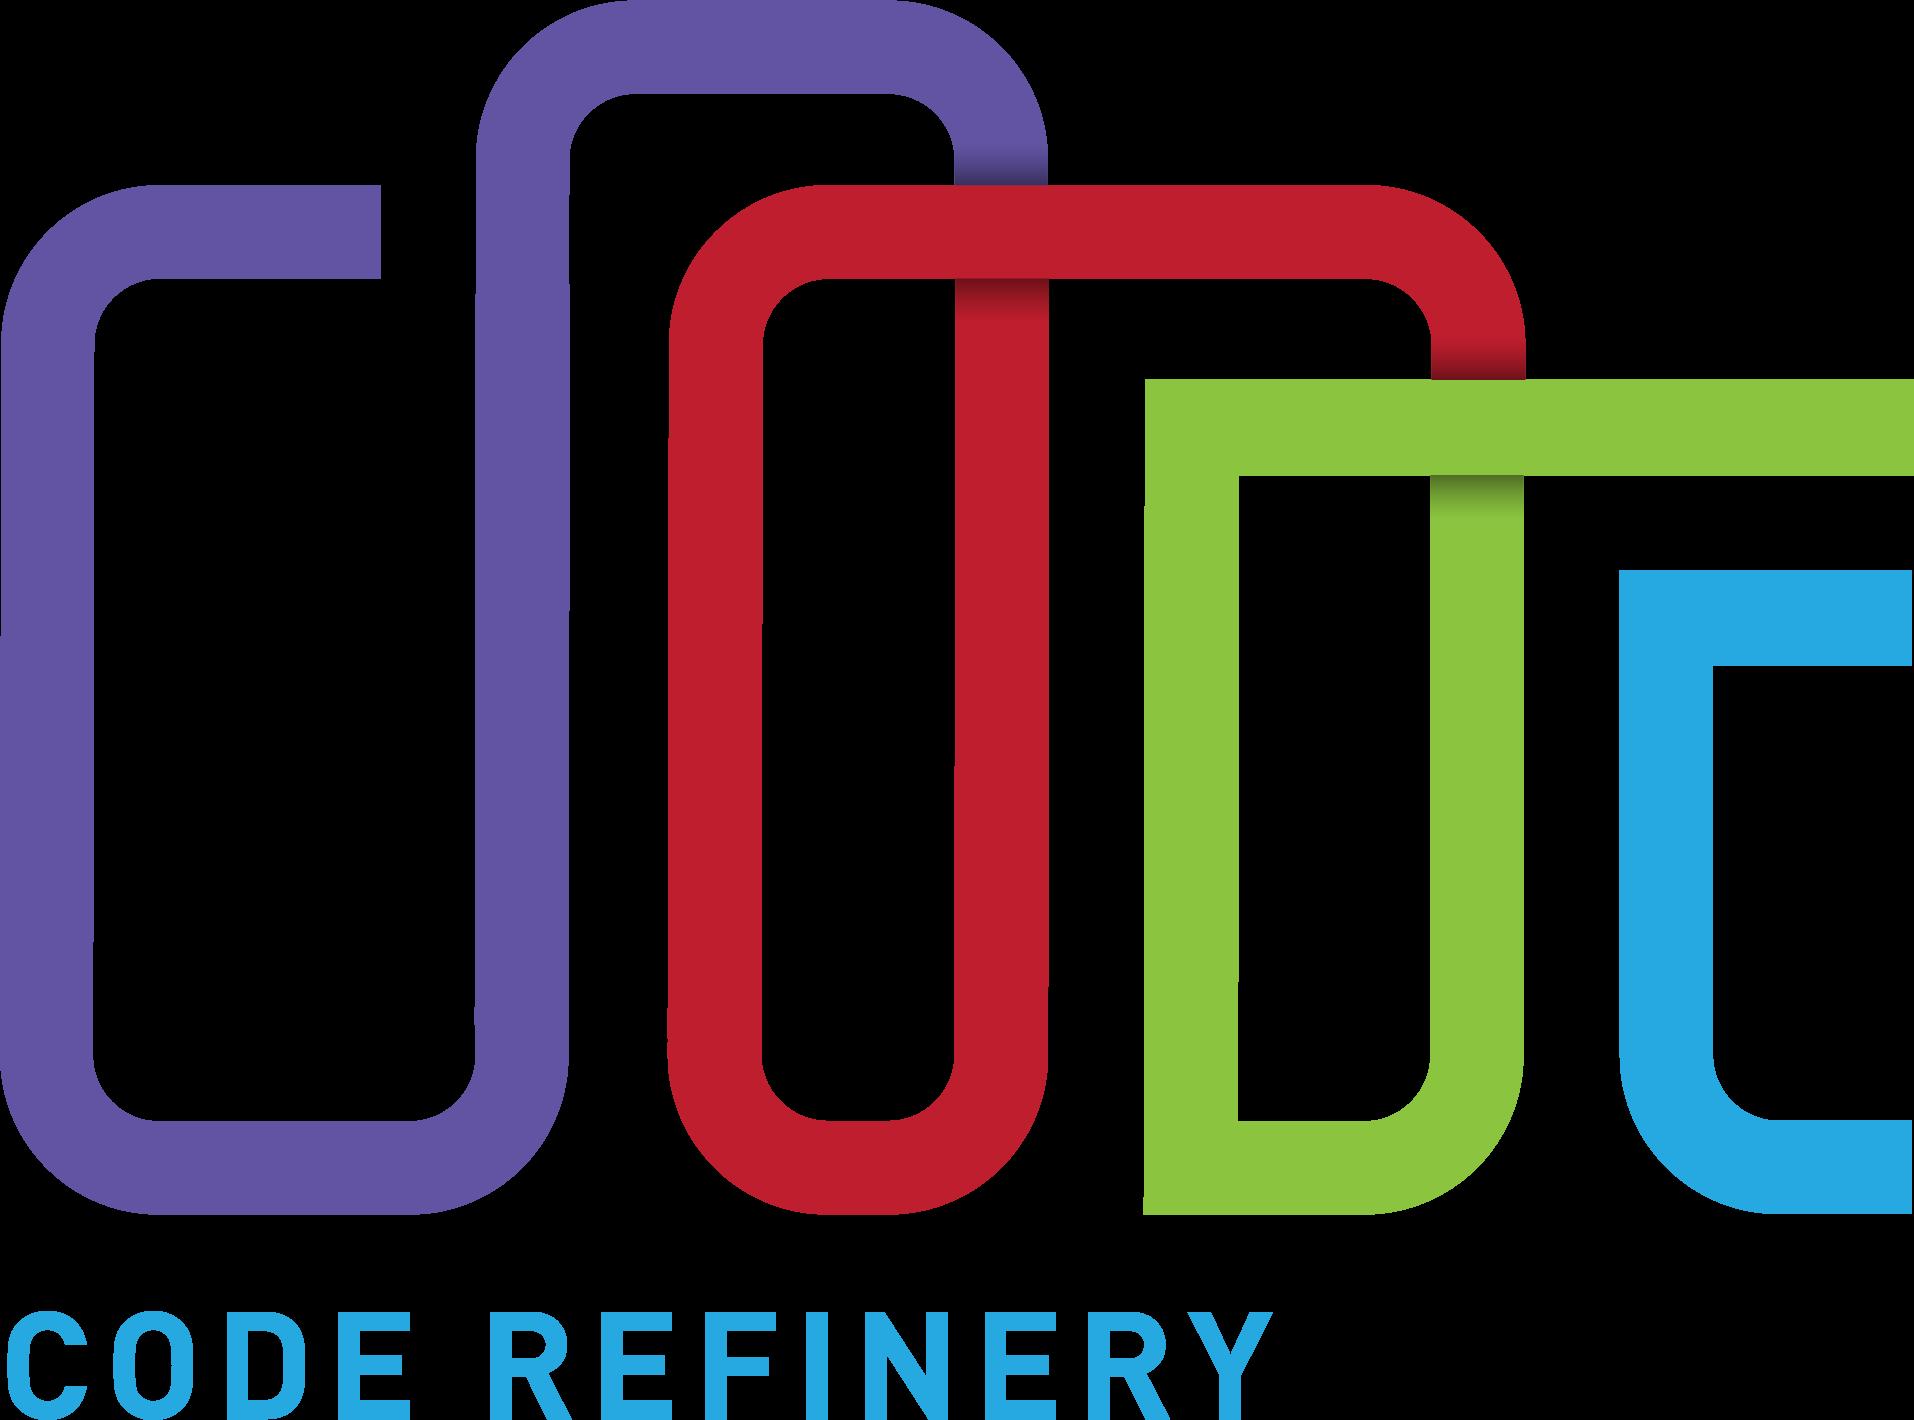 CodeRefinery logo